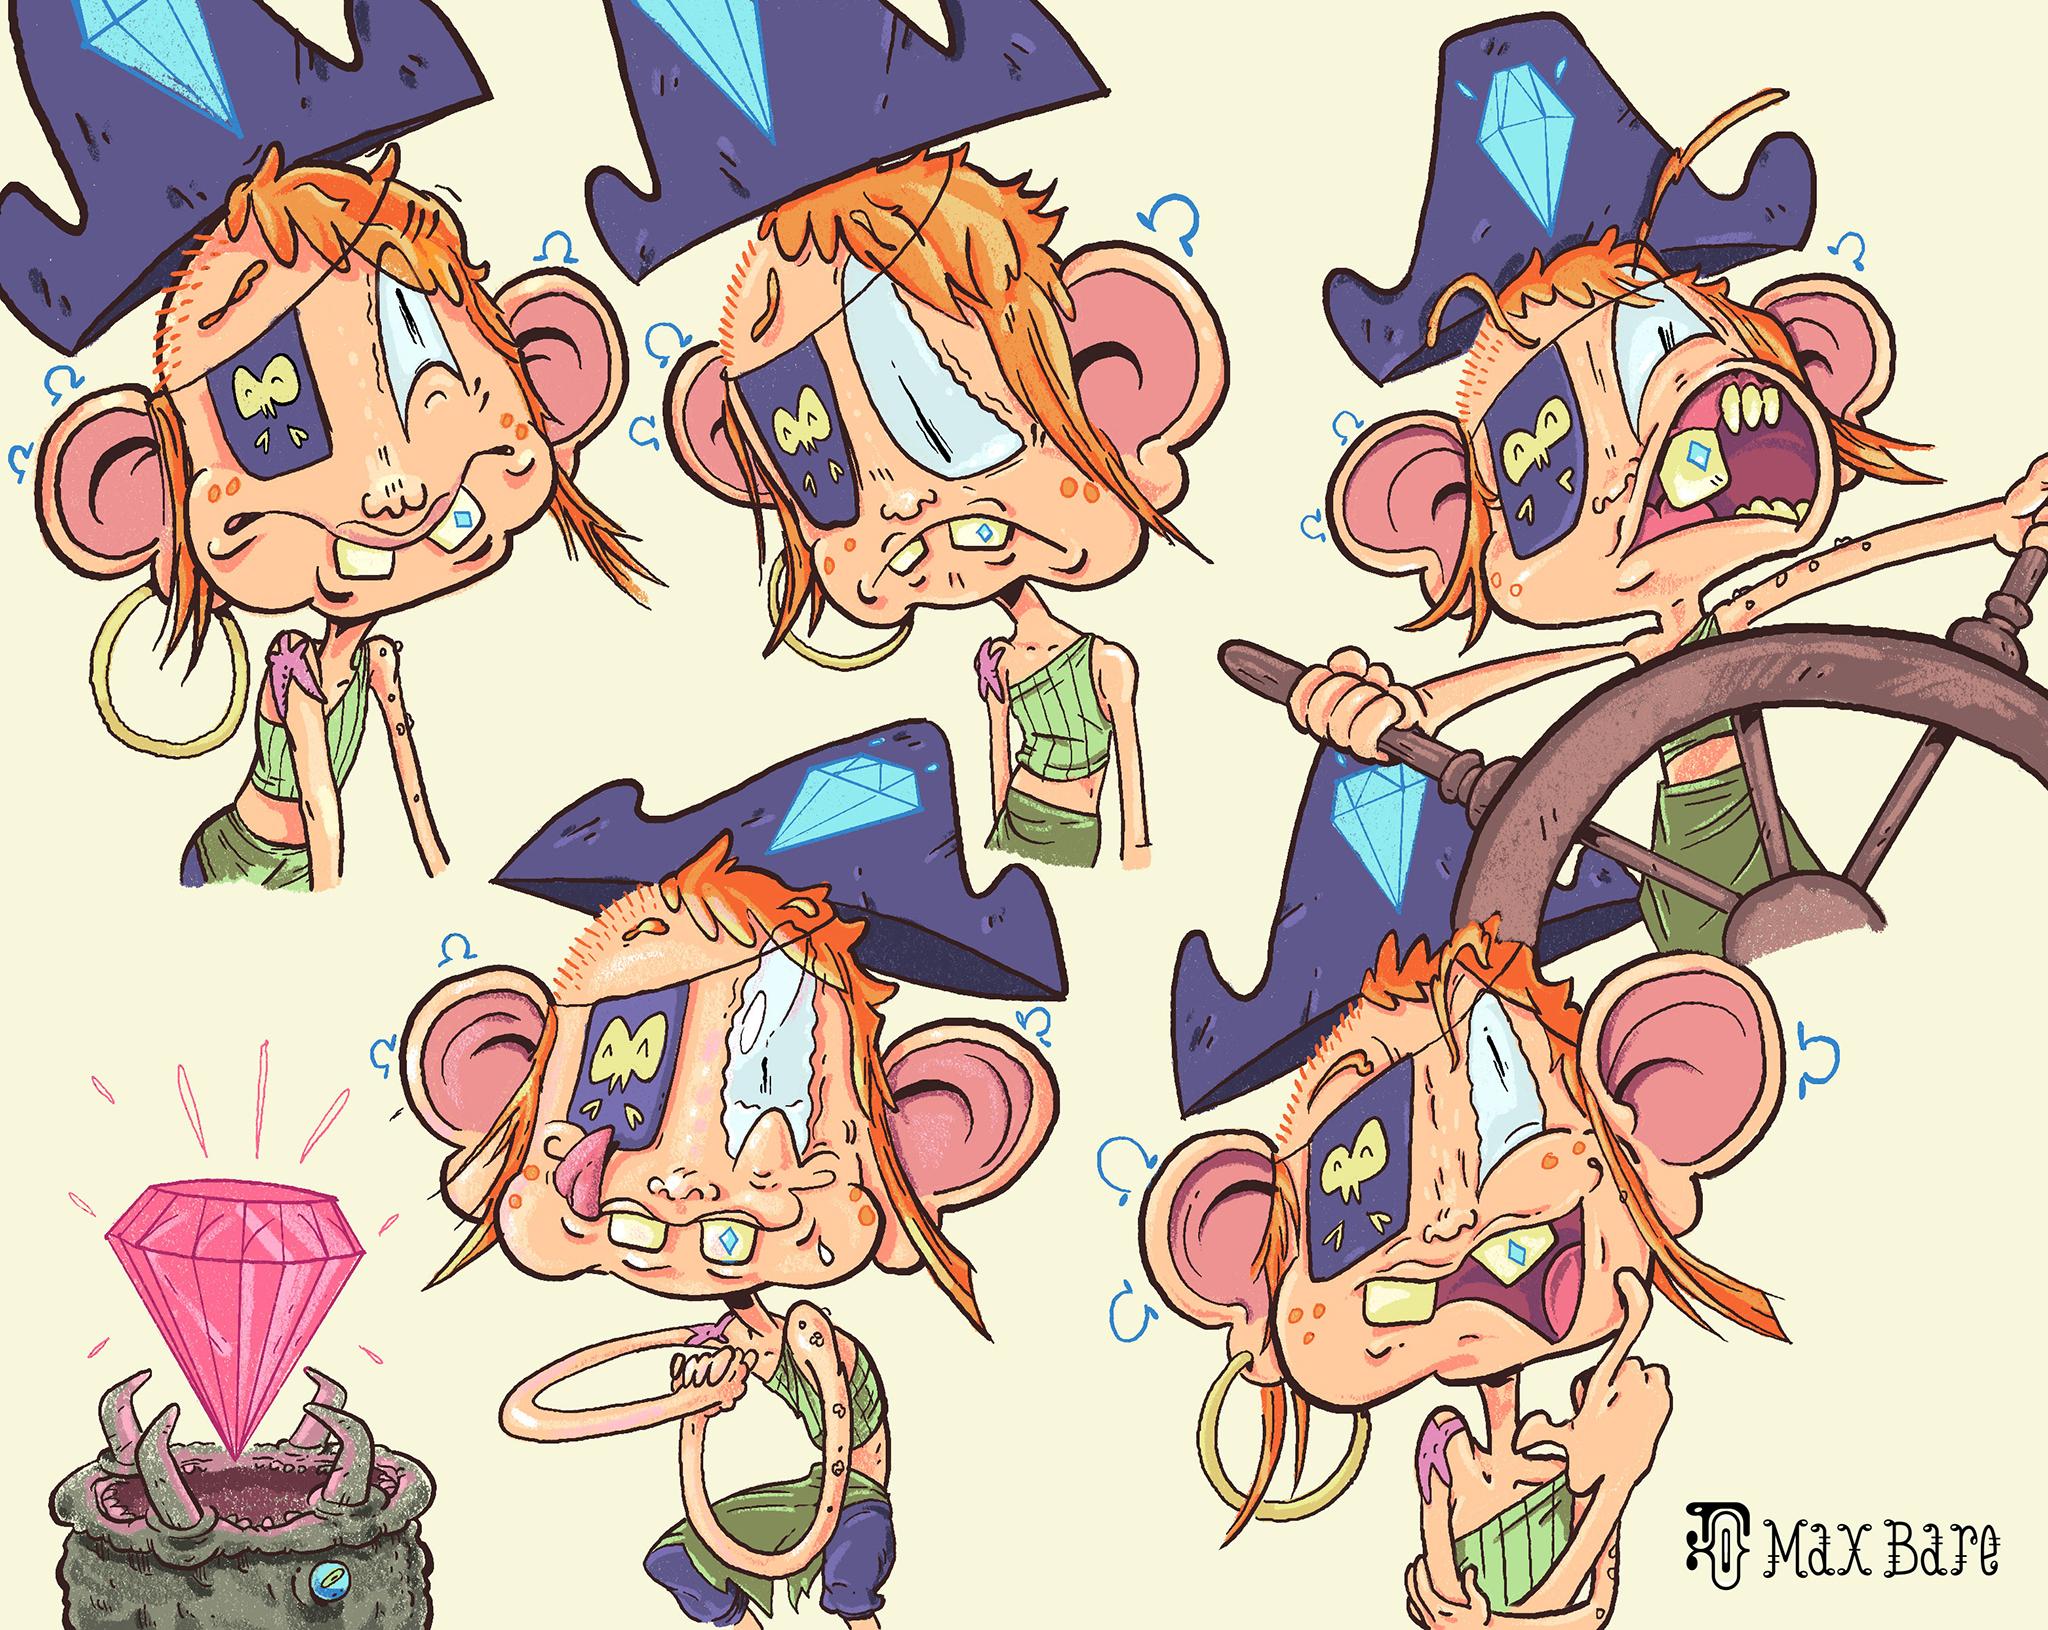 pirate-character-study-1.jpg